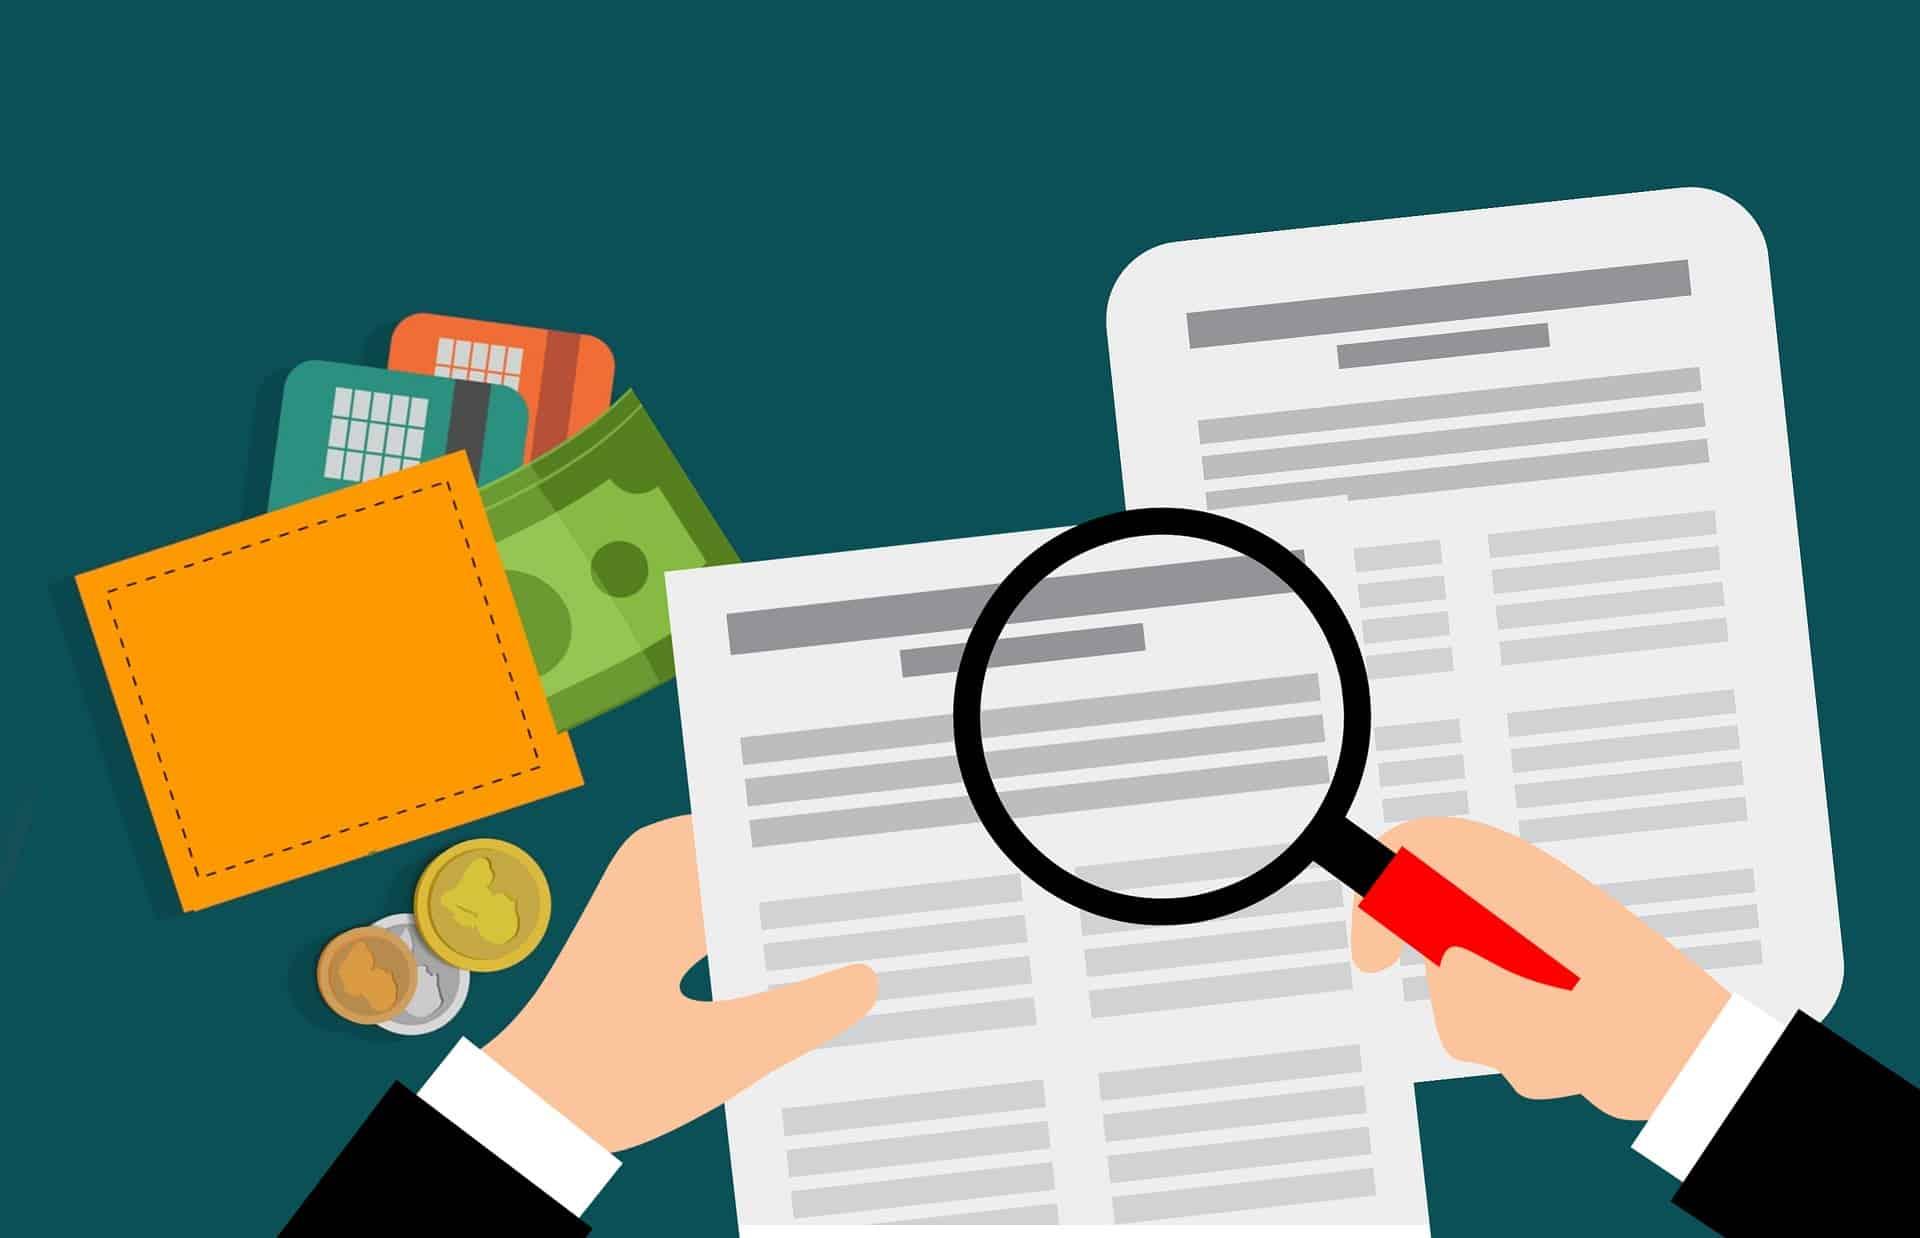 Credit Bureaus and Credit Reports